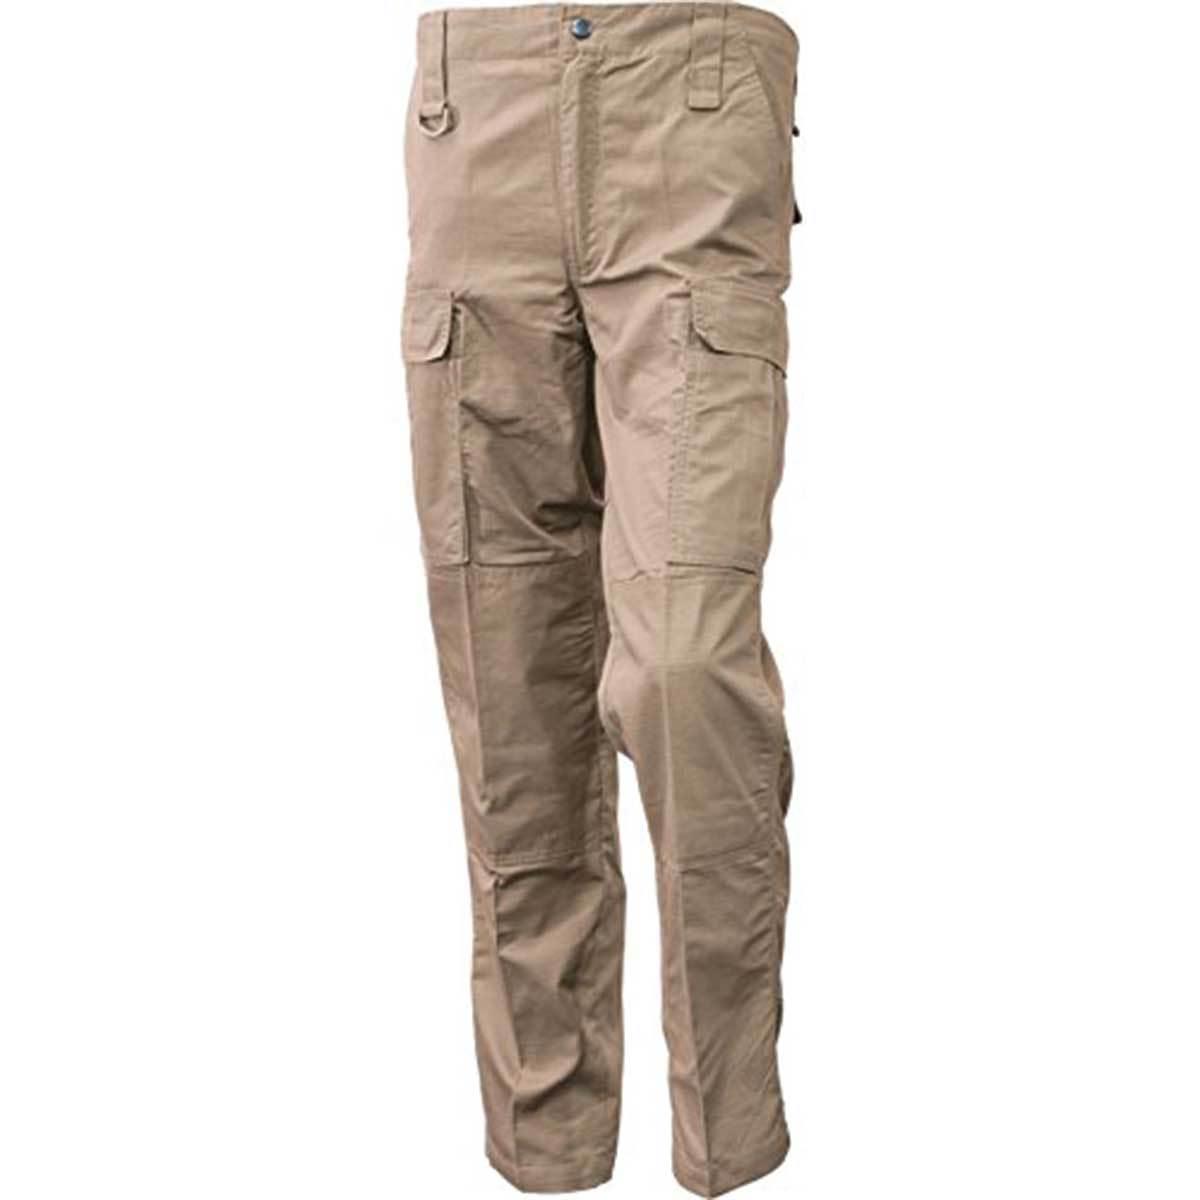 Tippmann Tactical TDU Pants - Tan - Small